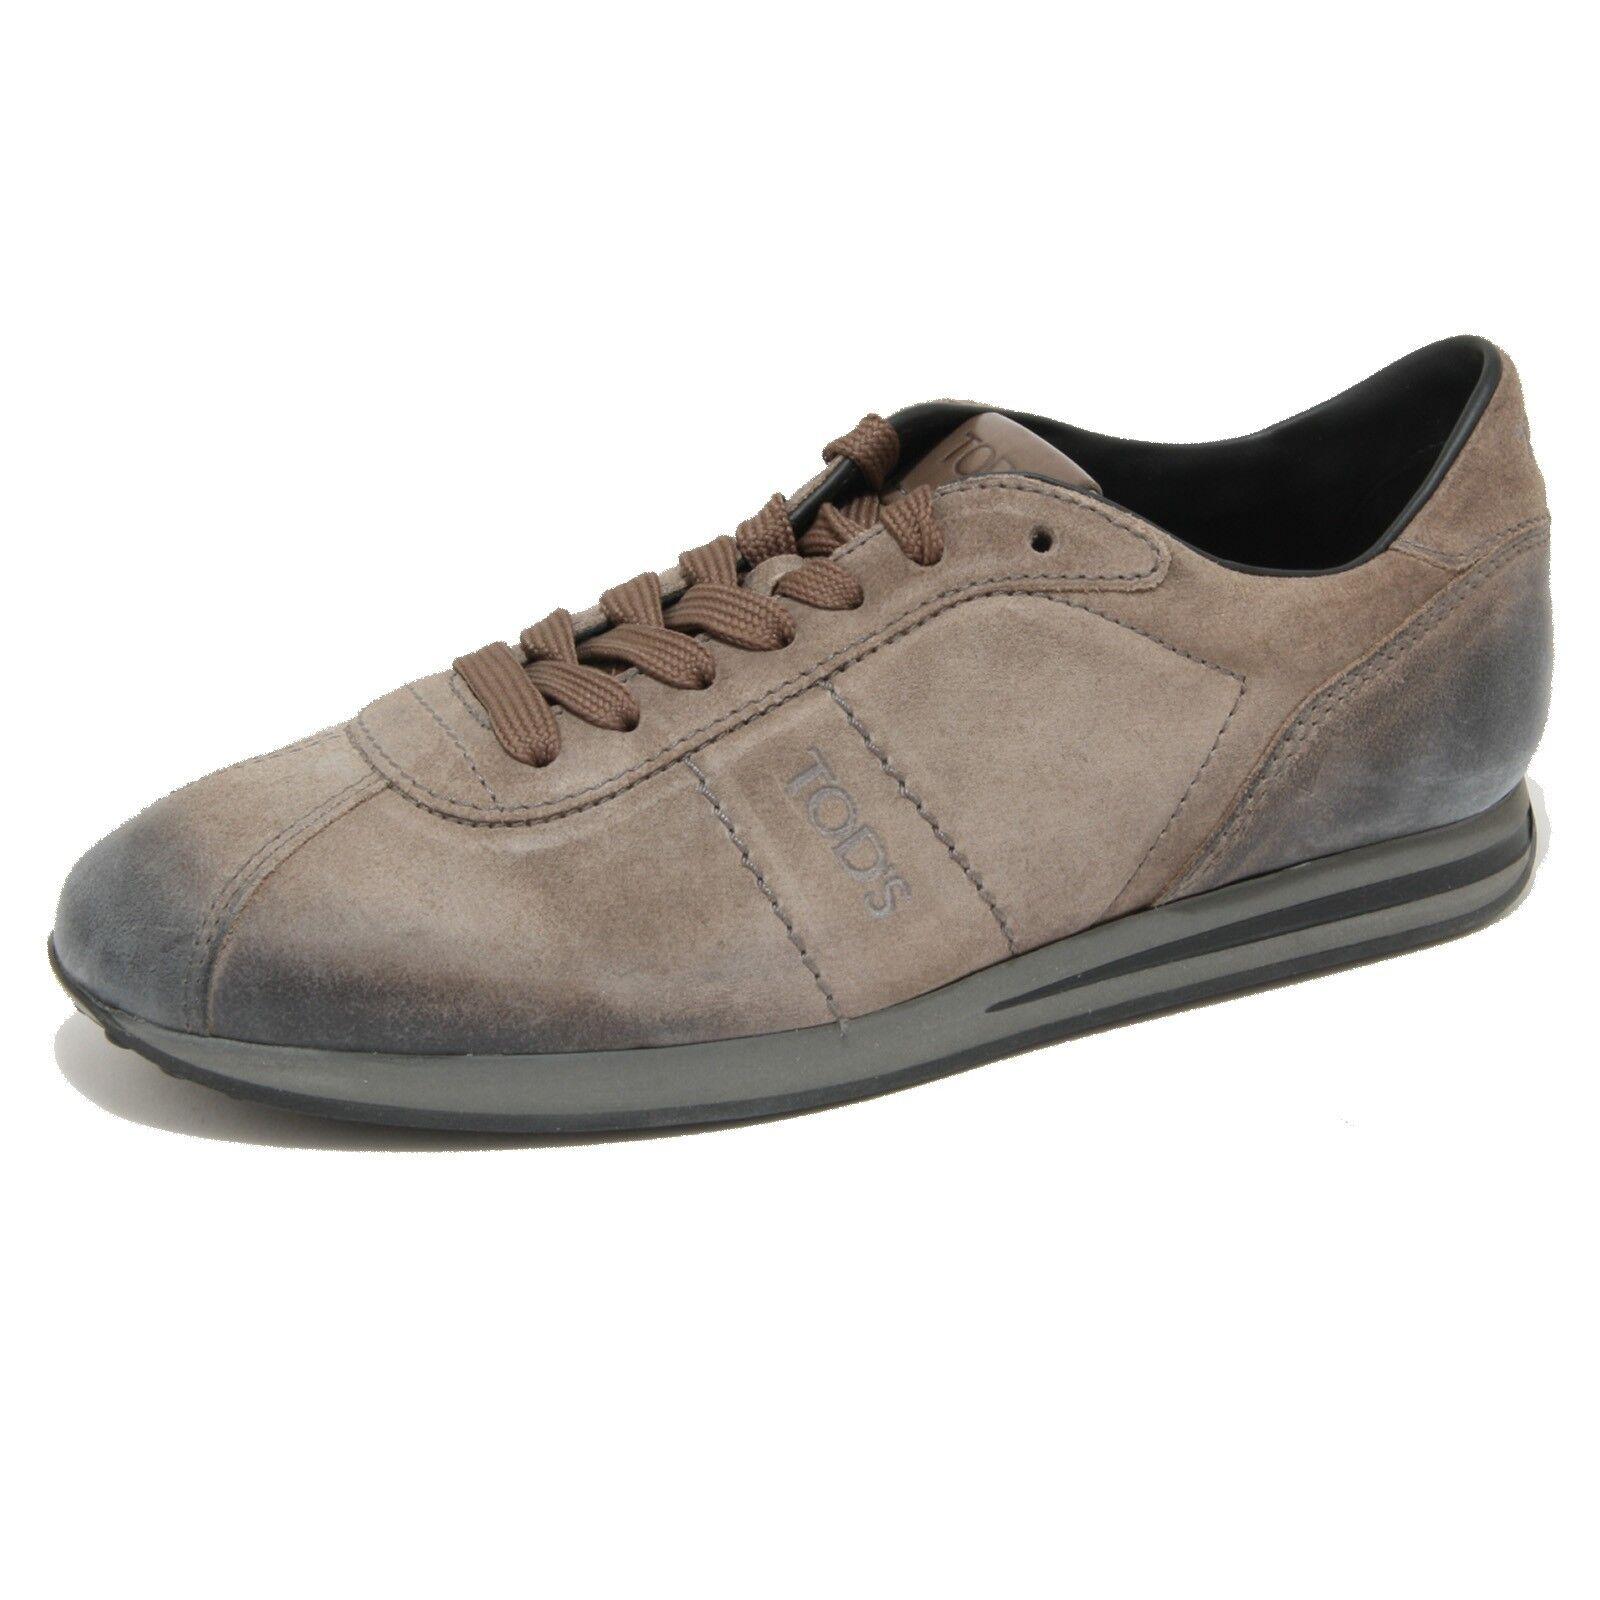 1806G sneaker tortora TOD'S ALLACCIATO SPORTIVO scarpa uomo shoes Uomo